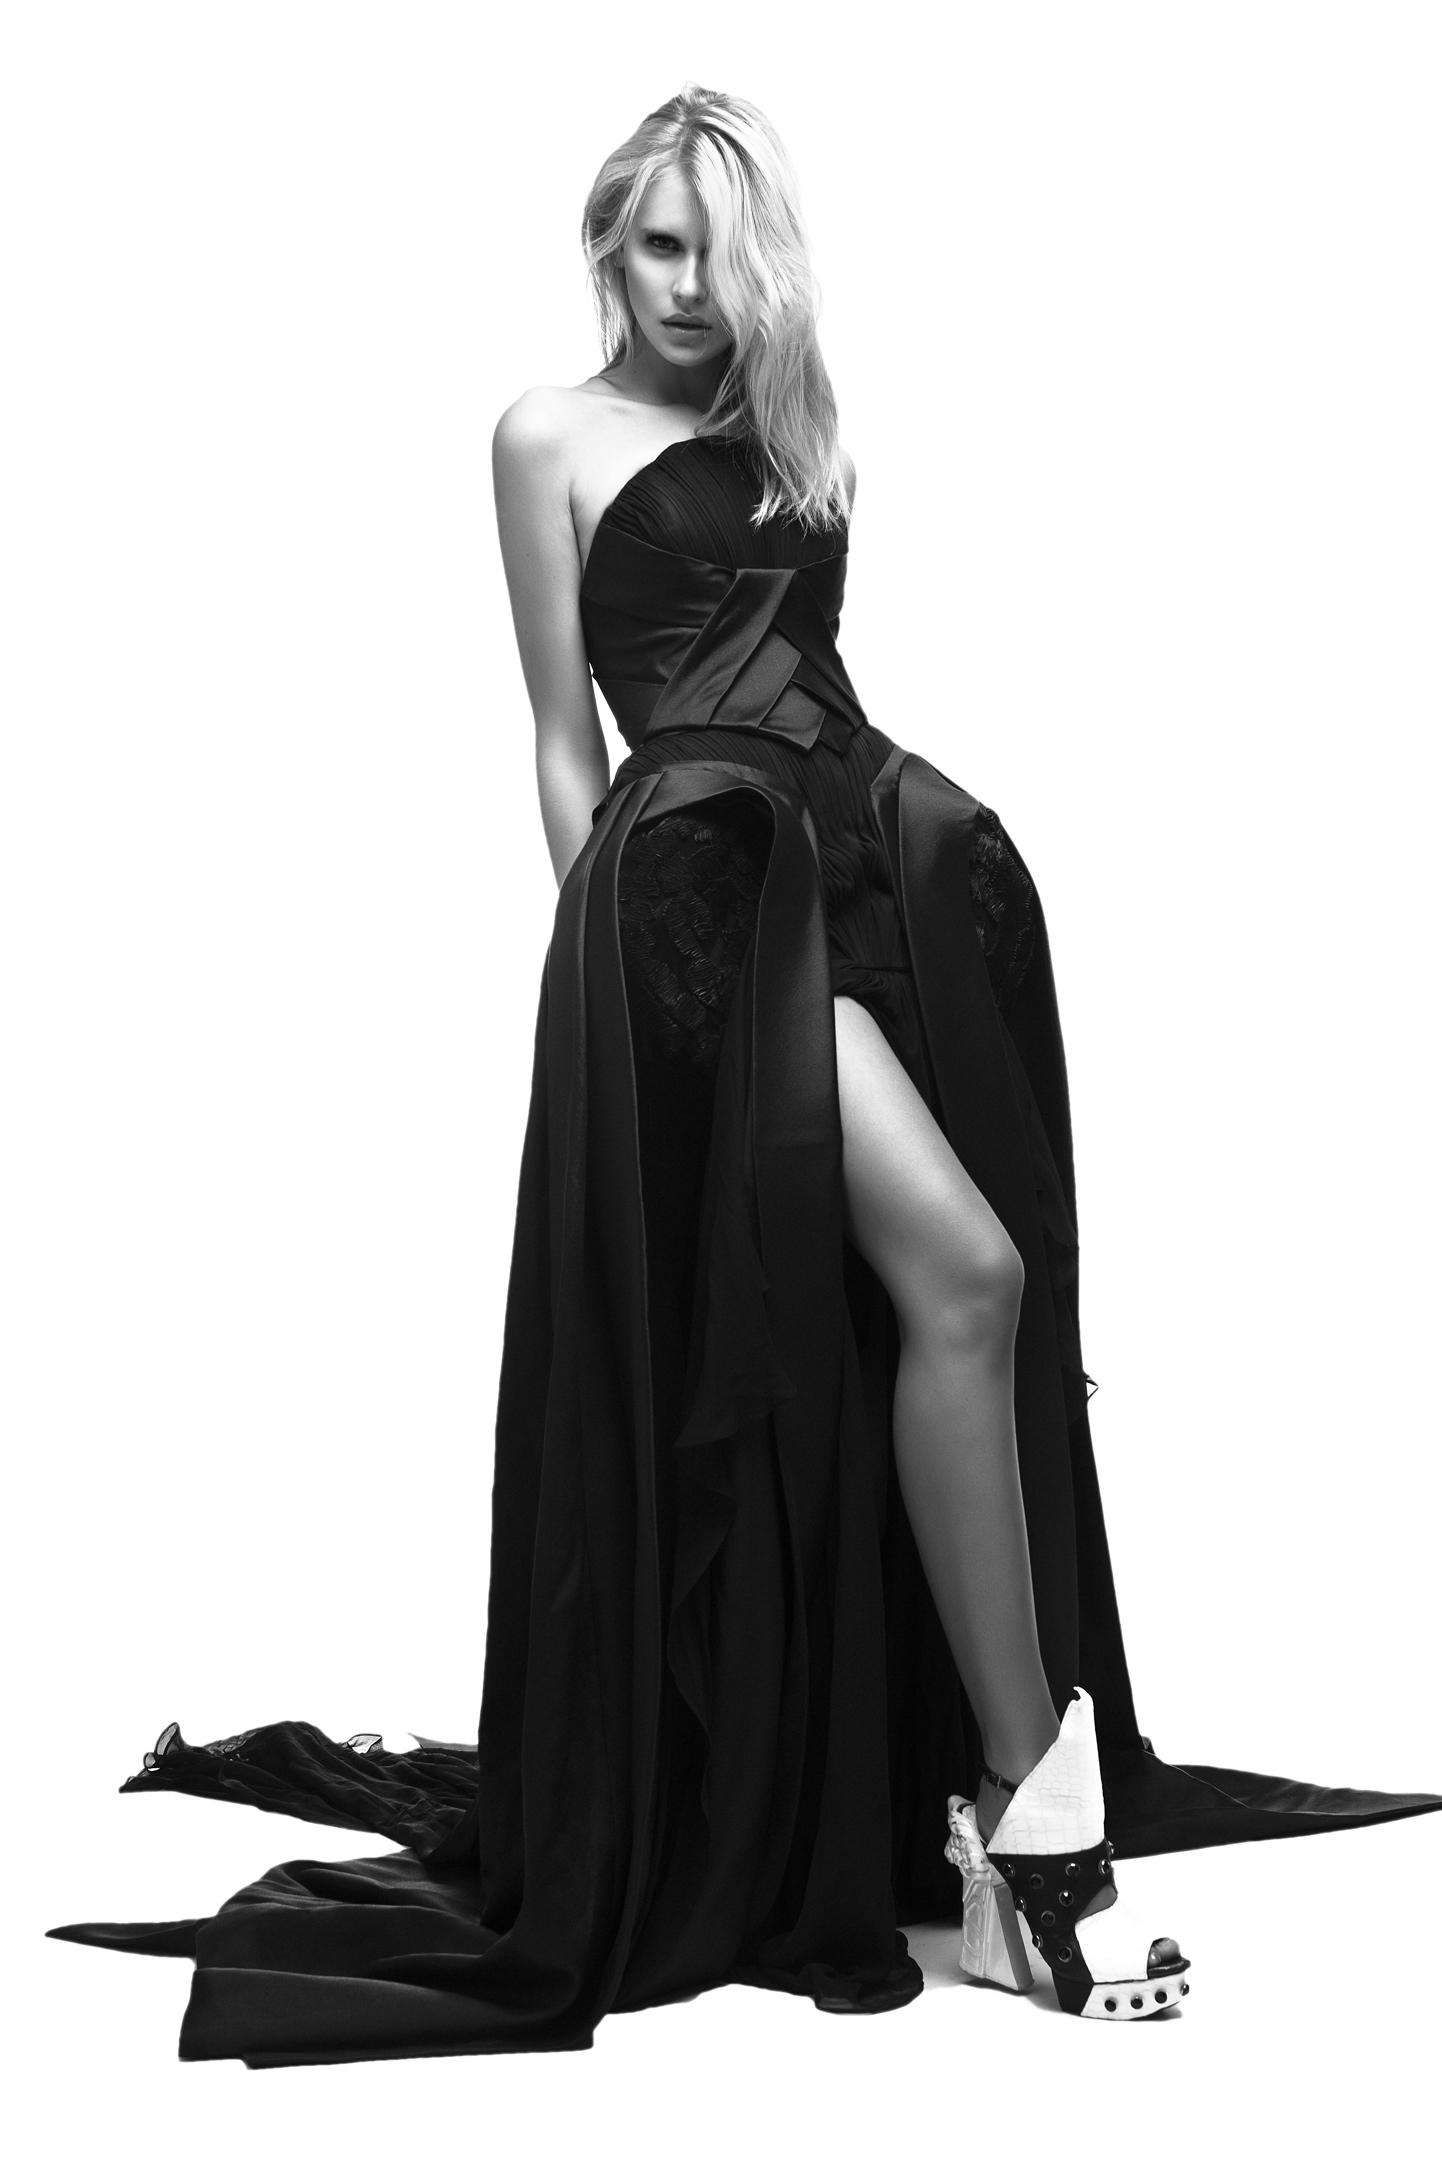 Maleficent-by-ANNA-BAZHANOVA-dh-16